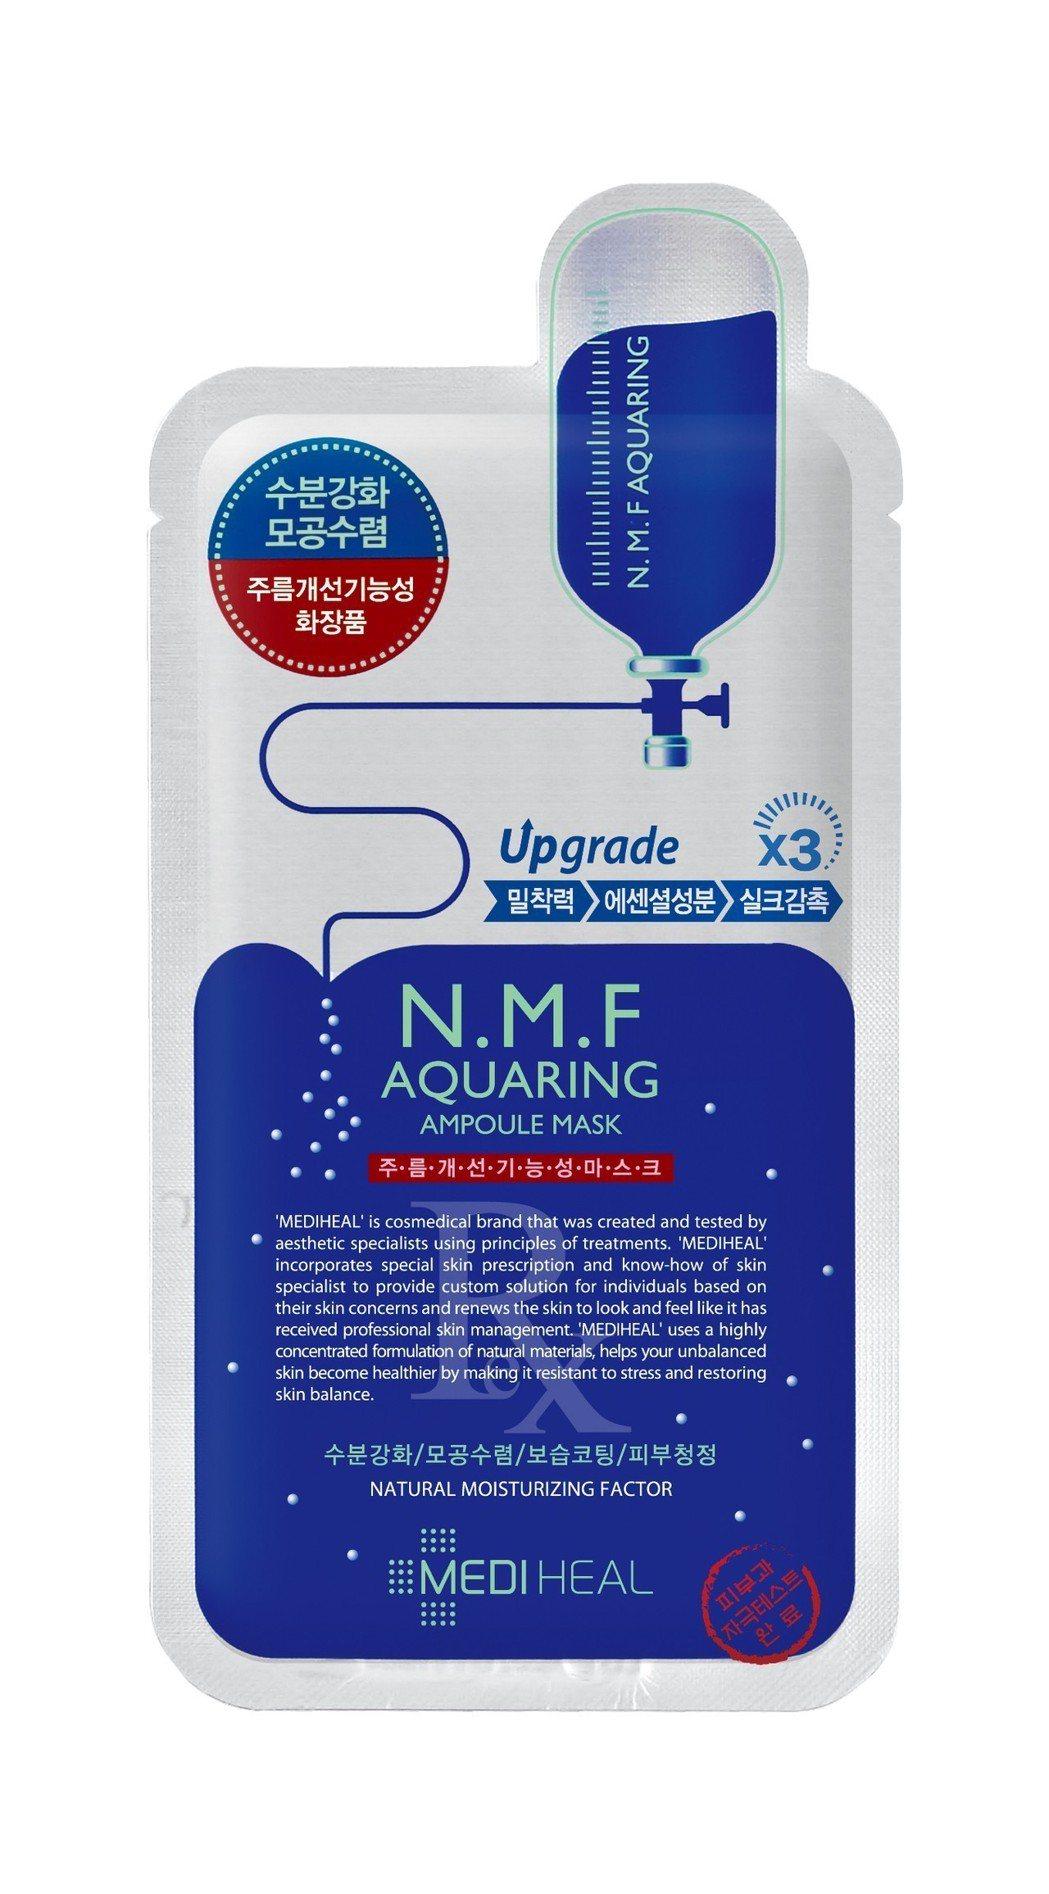 MEDIHEAL高效特強保濕導入面膜單片裝,原價99元、3月28日前第2件6折。...